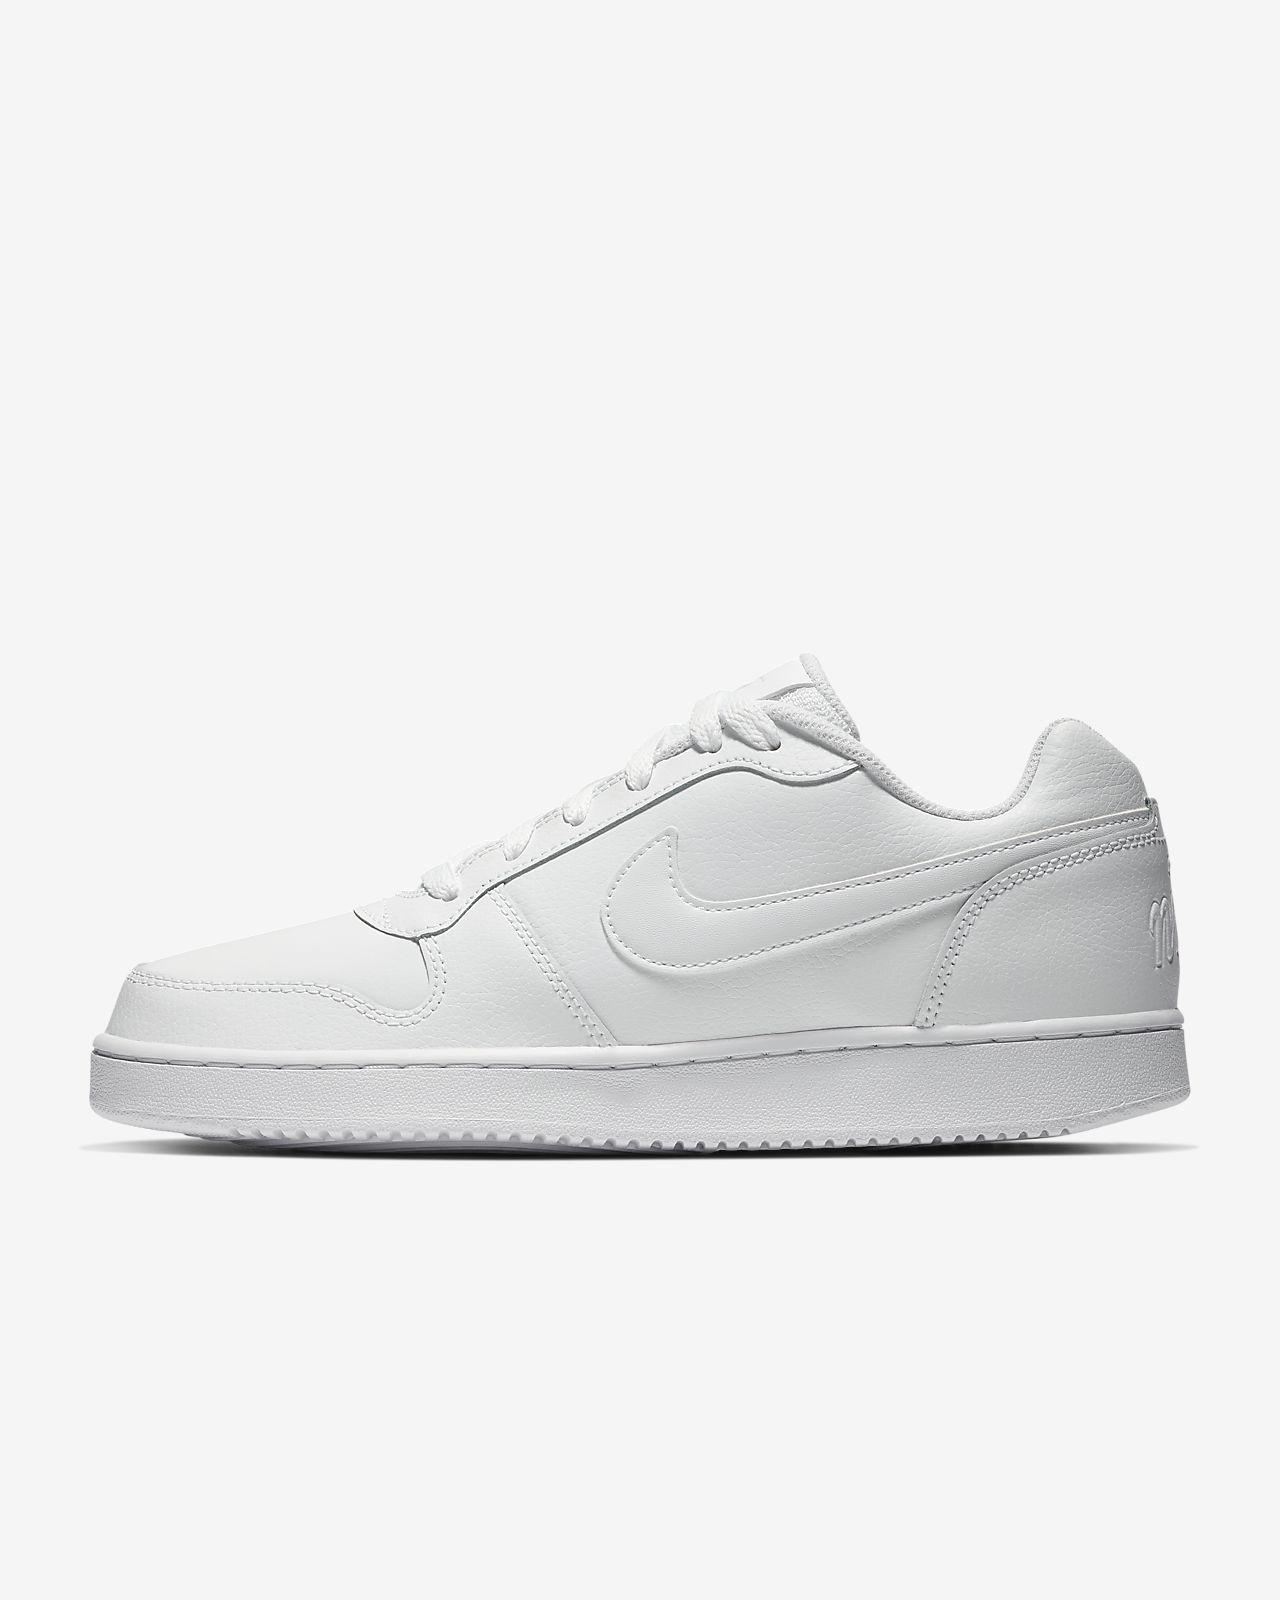 Nike Ebernon Low Damenschuh